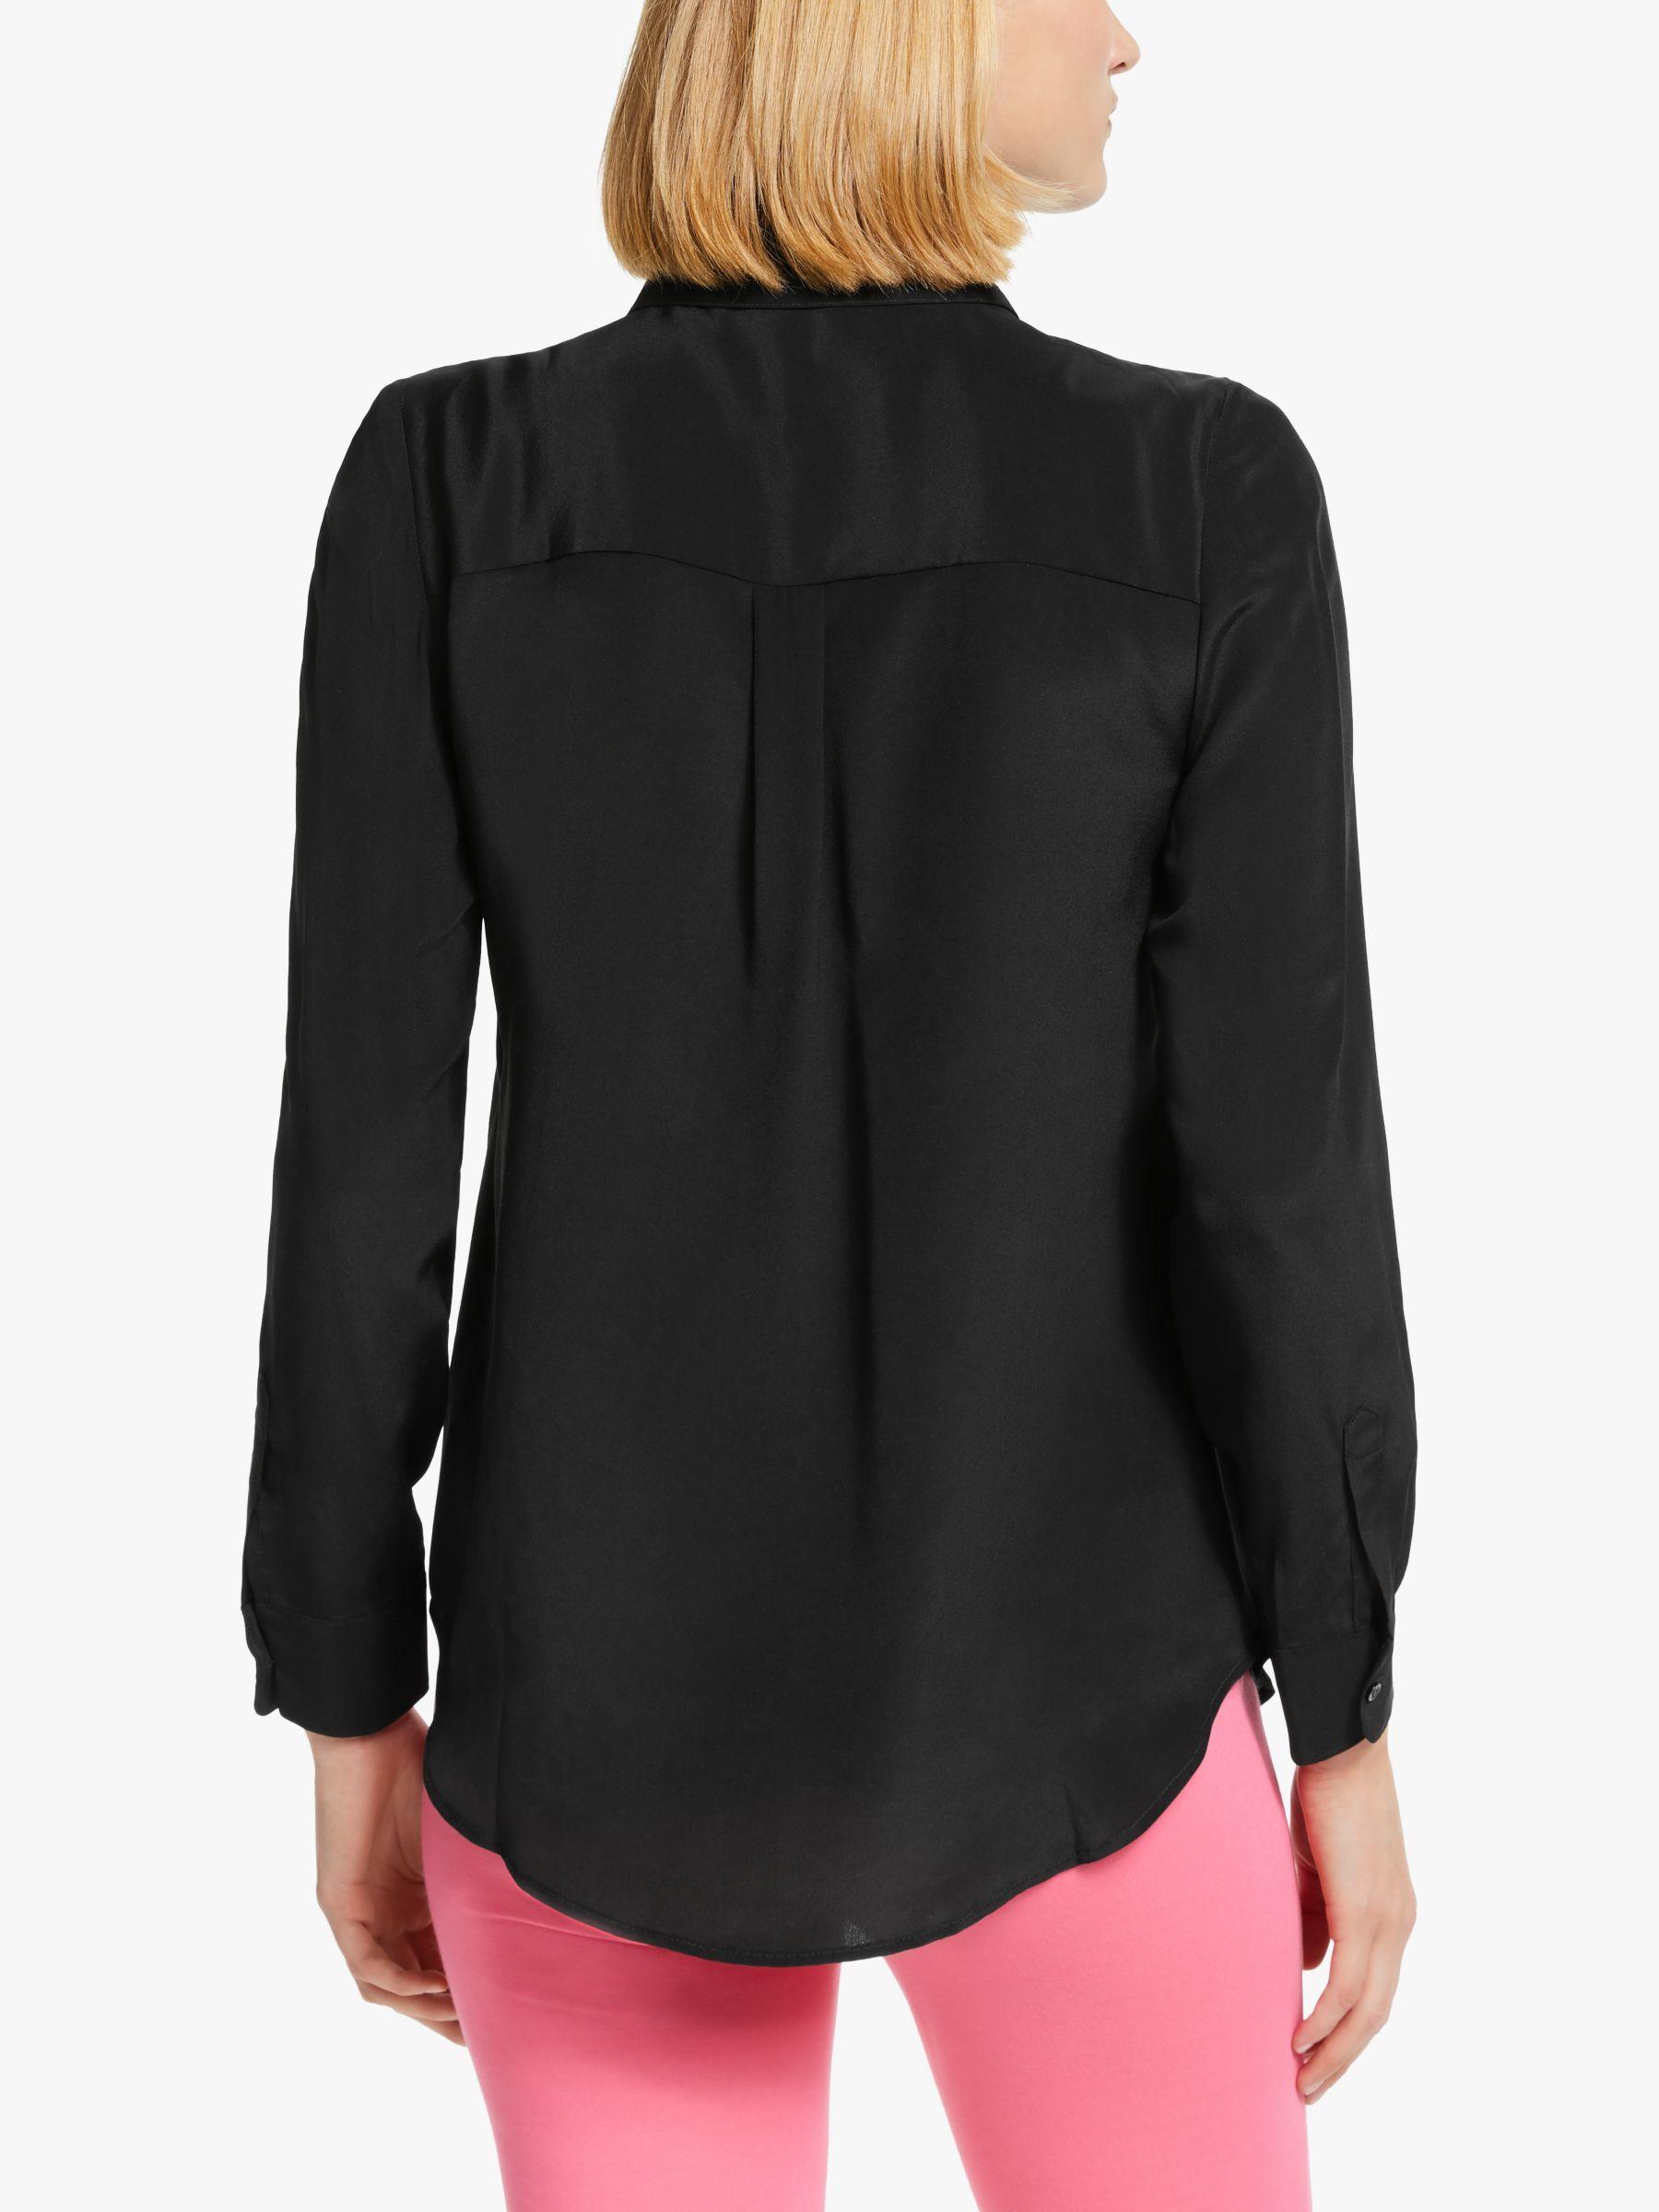 Boden The Silk Shirt in 2020 | Boden, Silk, Shirts